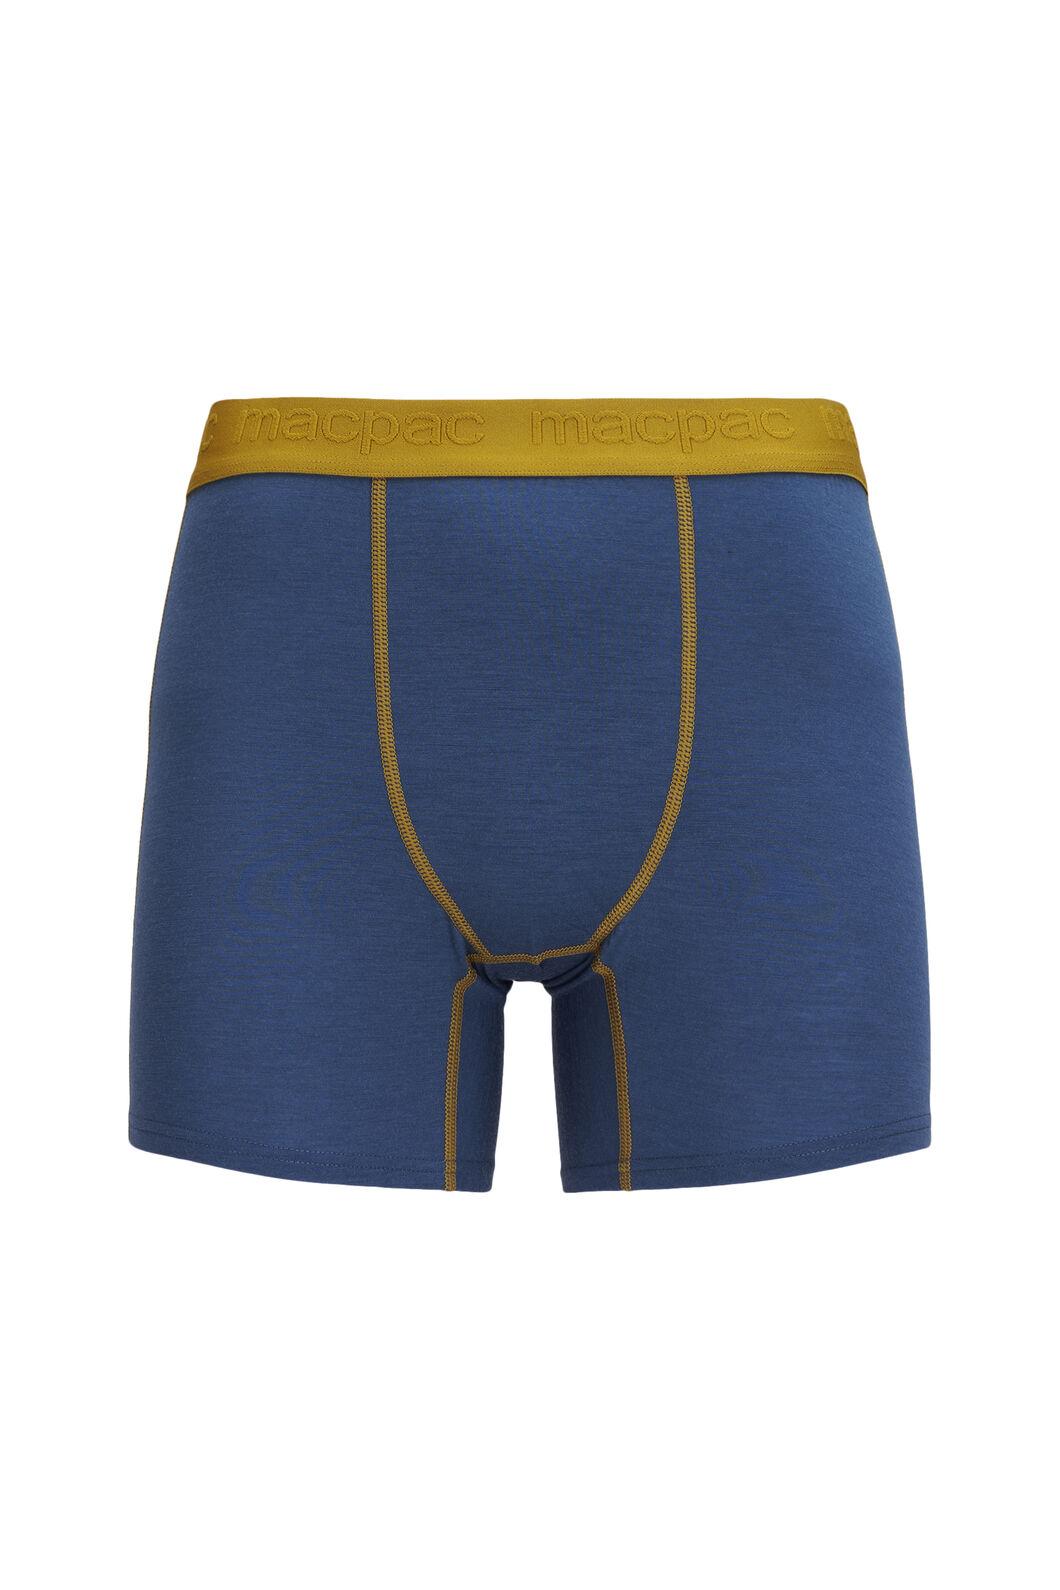 Macpac 180 Merino Boxers — Men's, Orion Blue/Dried Tussock, hi-res